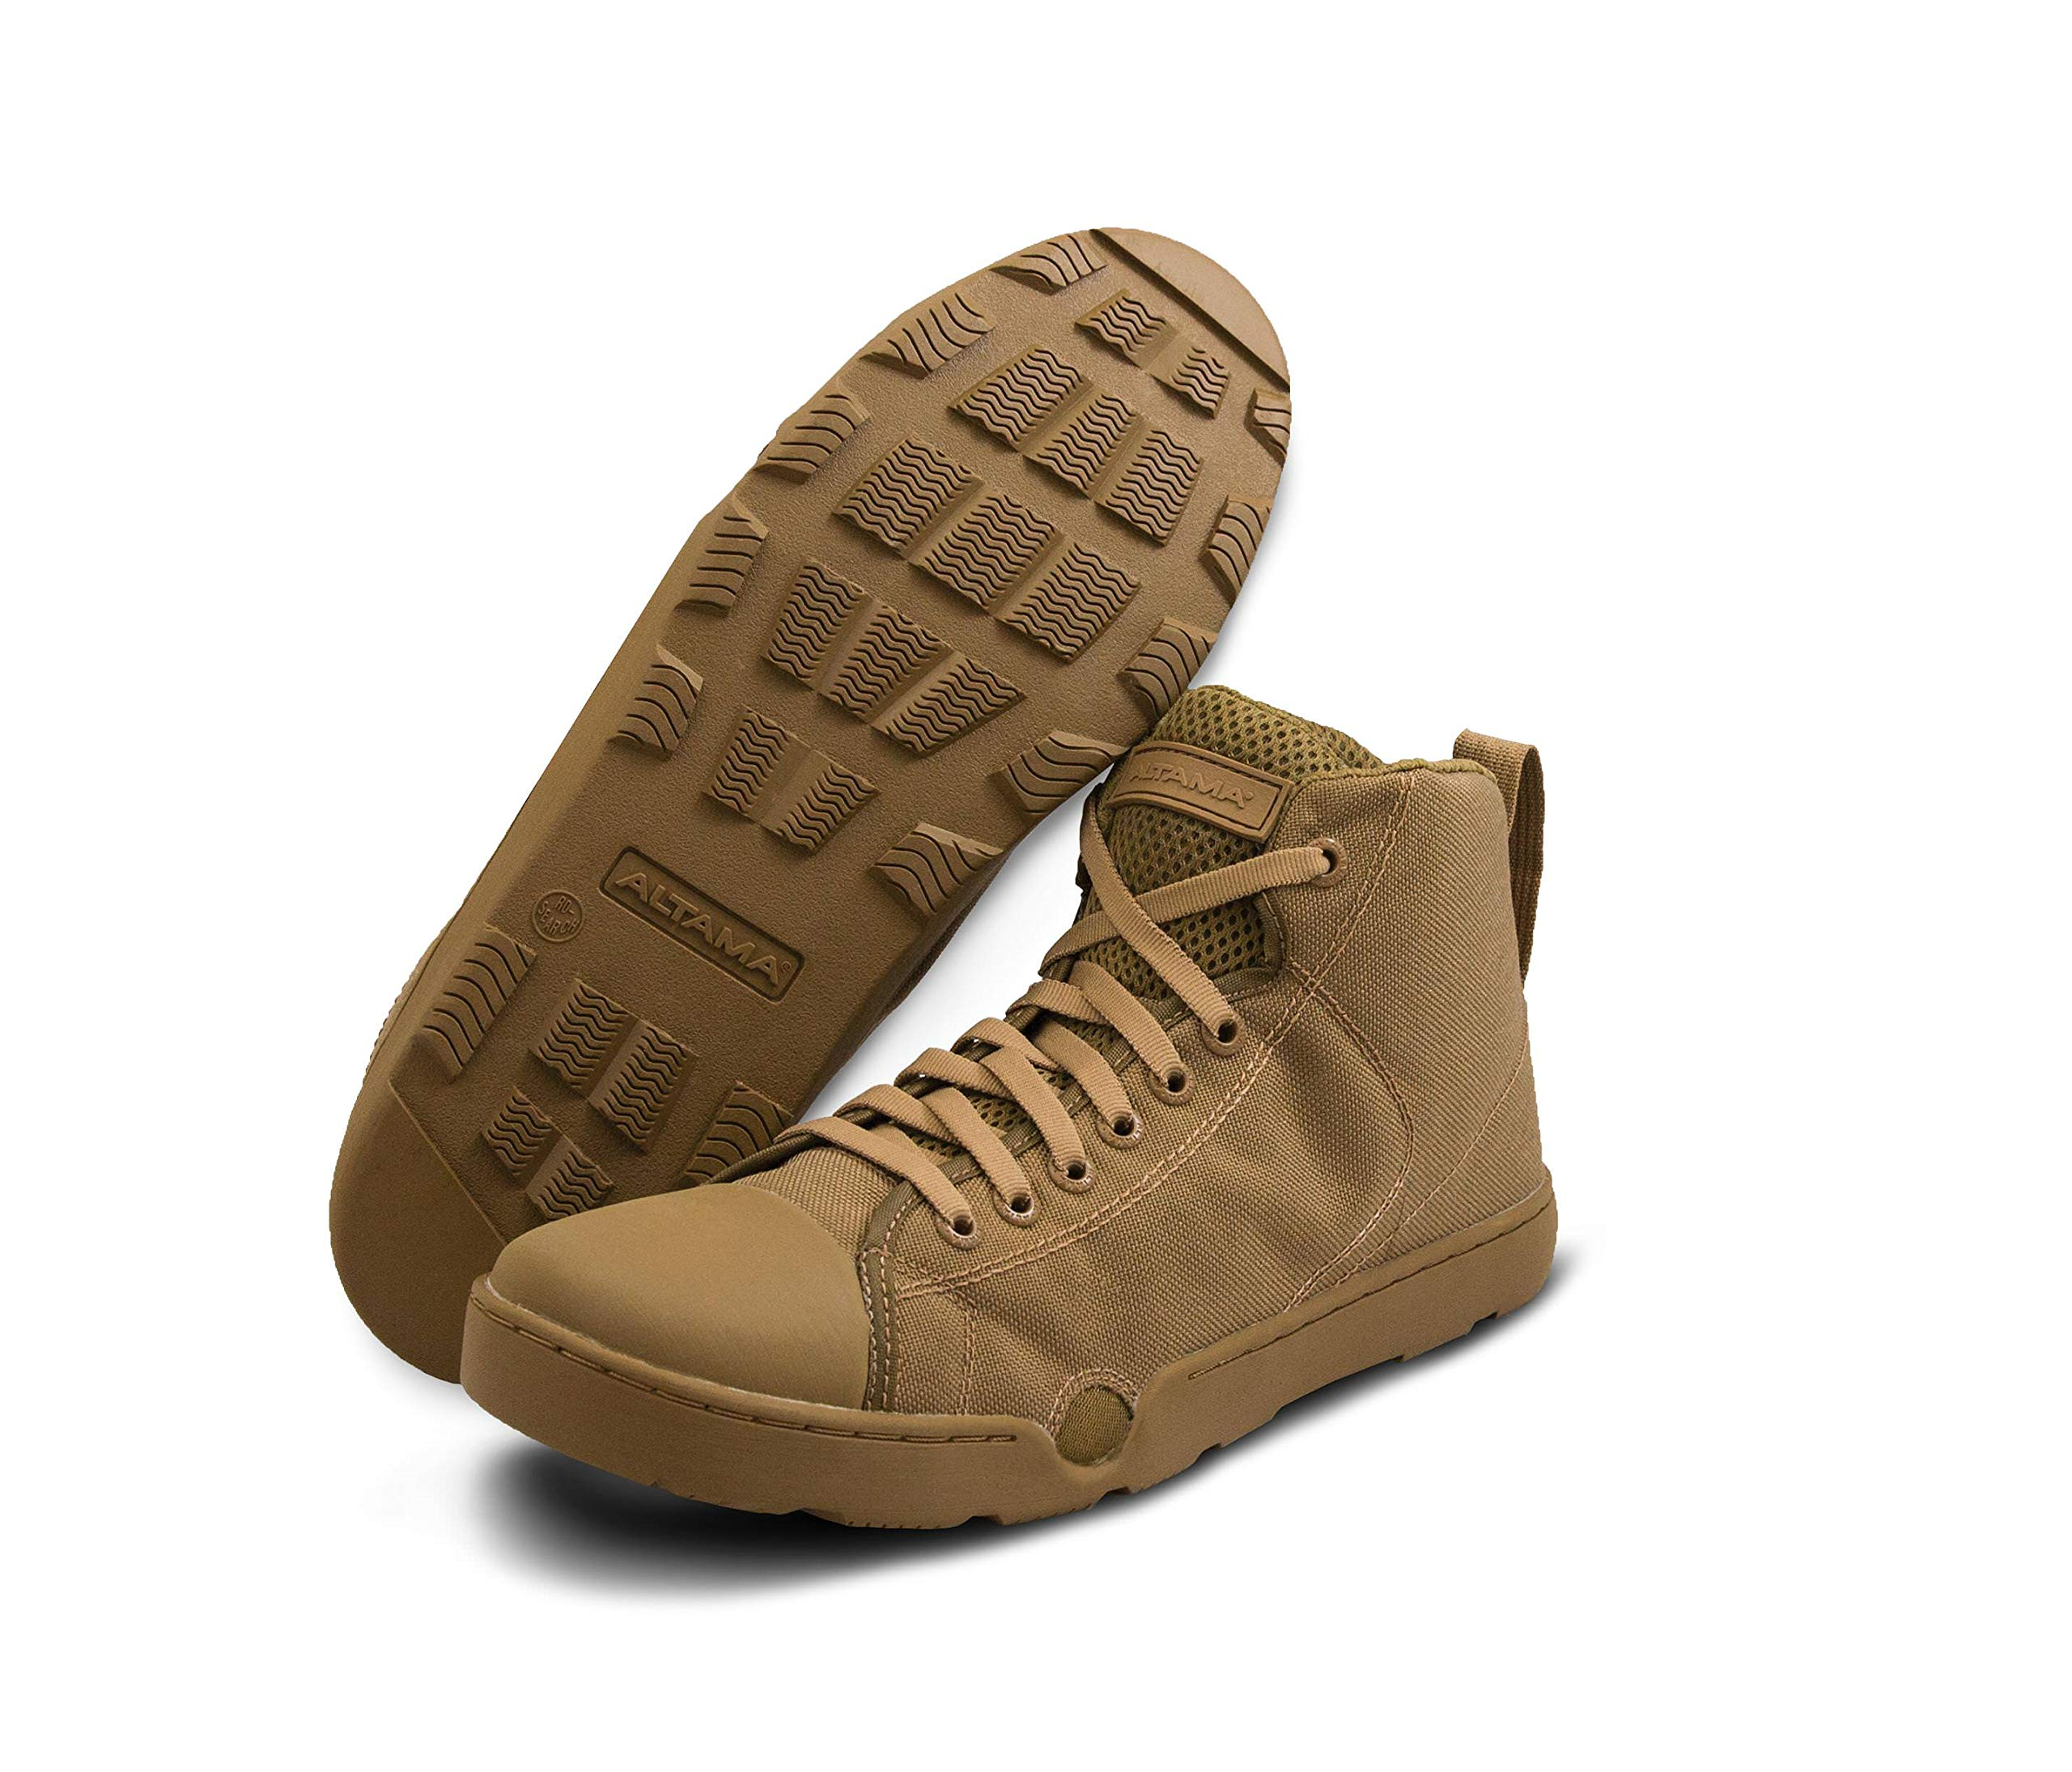 57f15ad34de Altama Boots 9.5 Top Deals & Lowest Price | SuperOffers.com